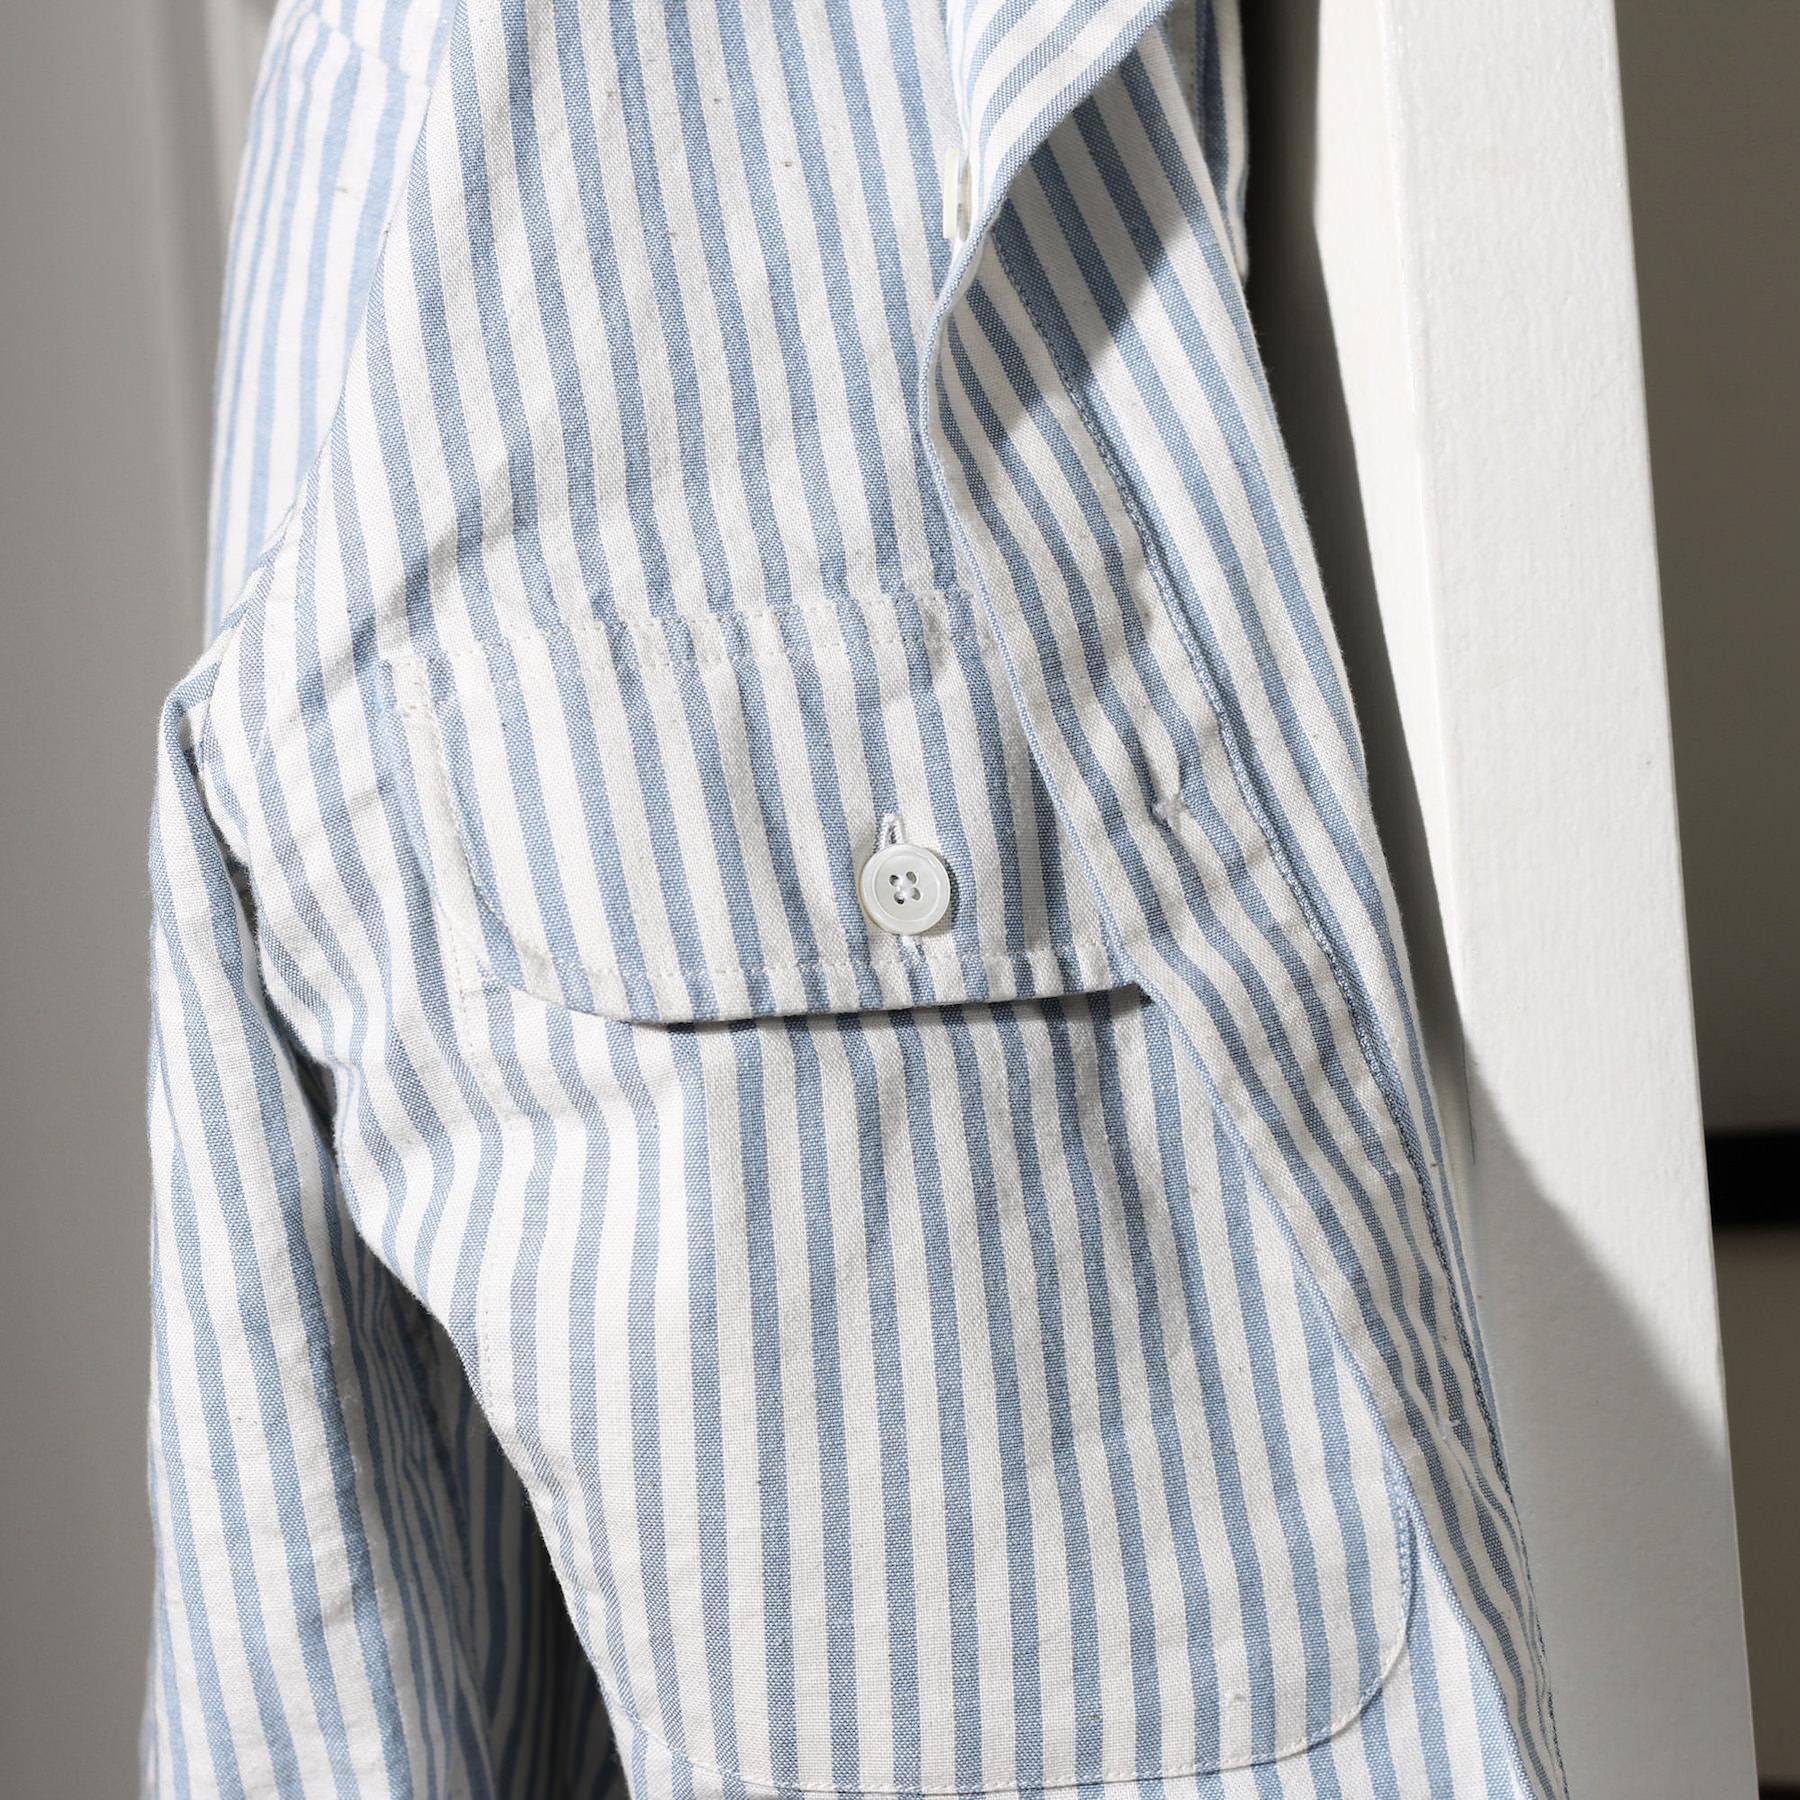 poche plaquee chemise sur mesure swann oscar